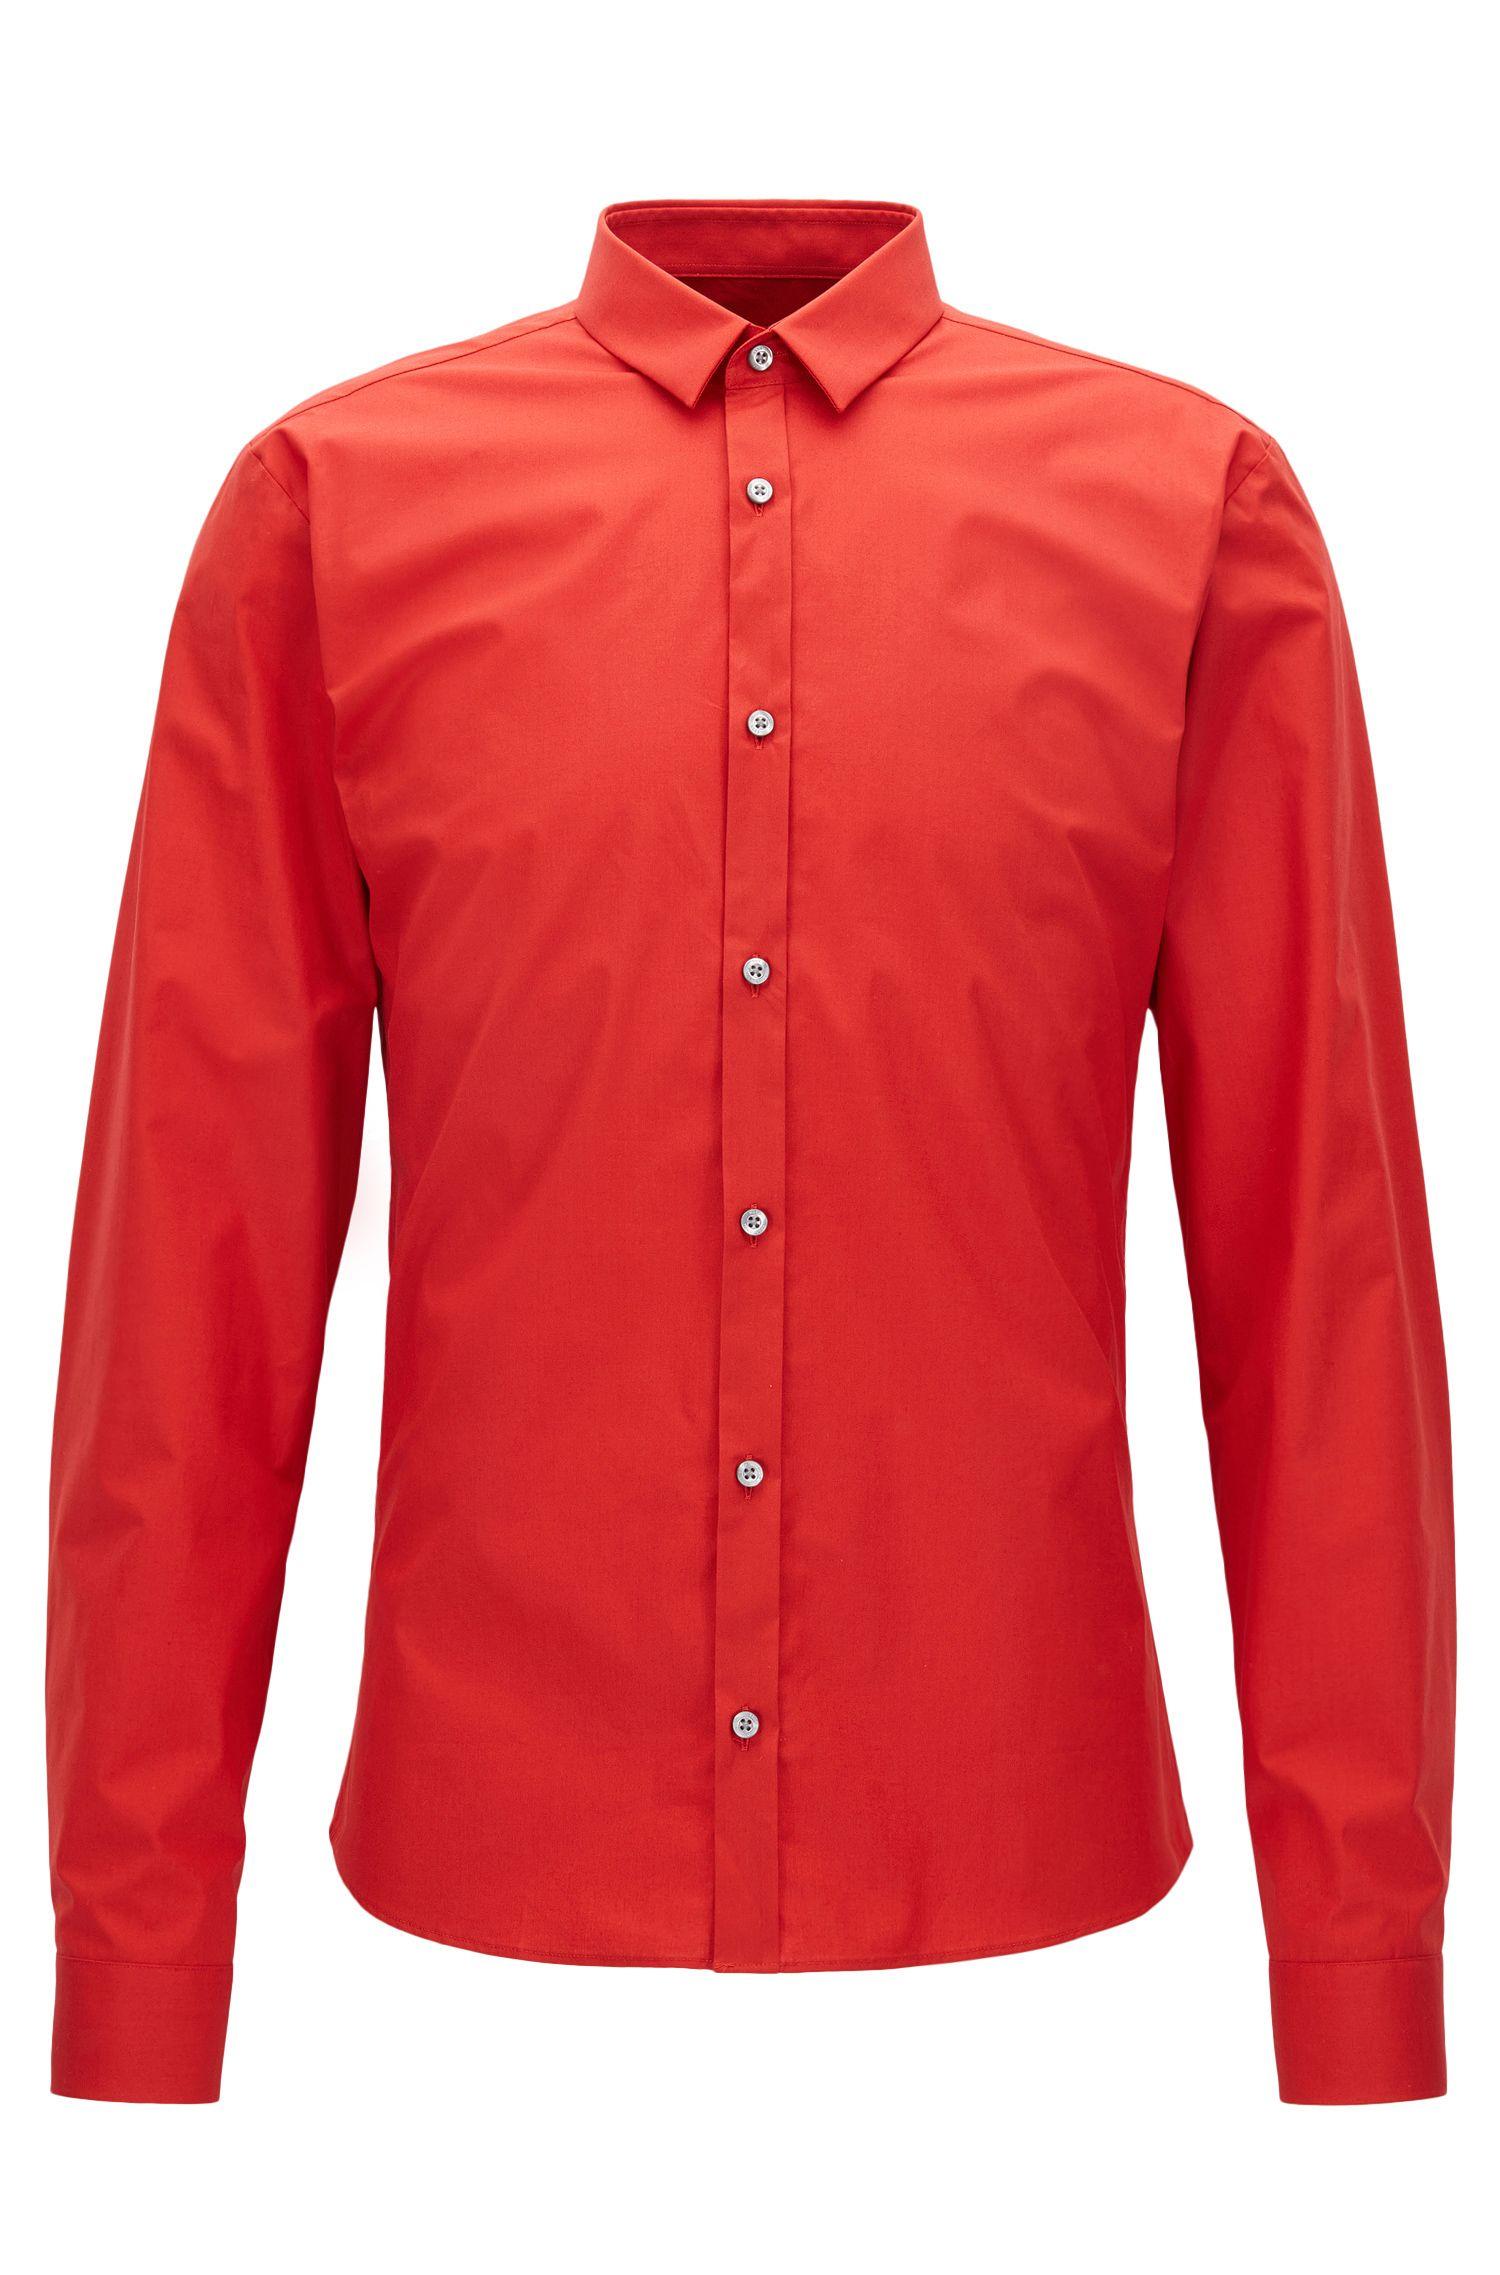 Stretch Cotton Button Down Shirt, Extra Slim Fit | Ero